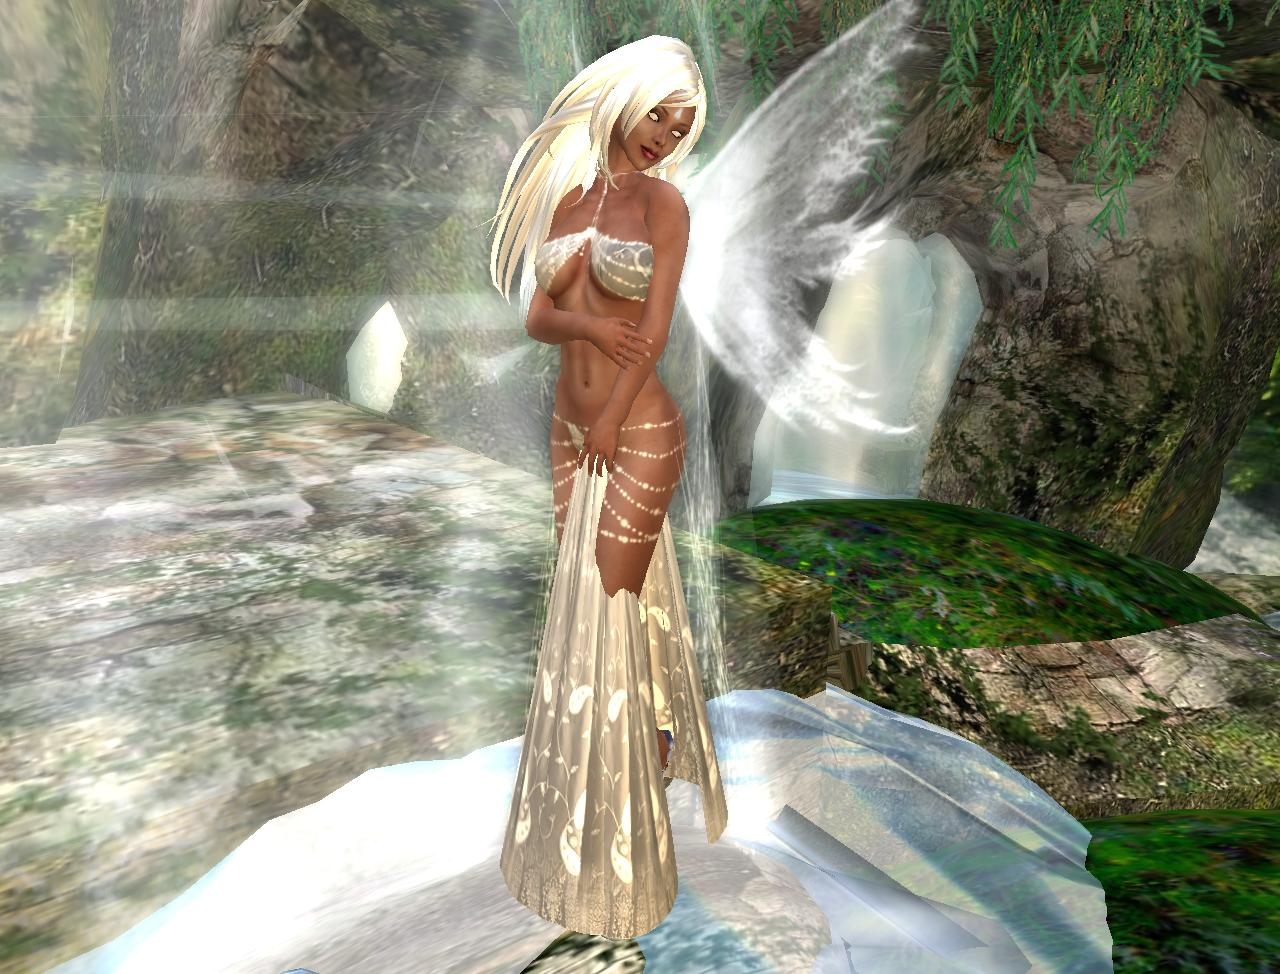 Fees et elfes ii page 2 - Dessin elfes et fees ...